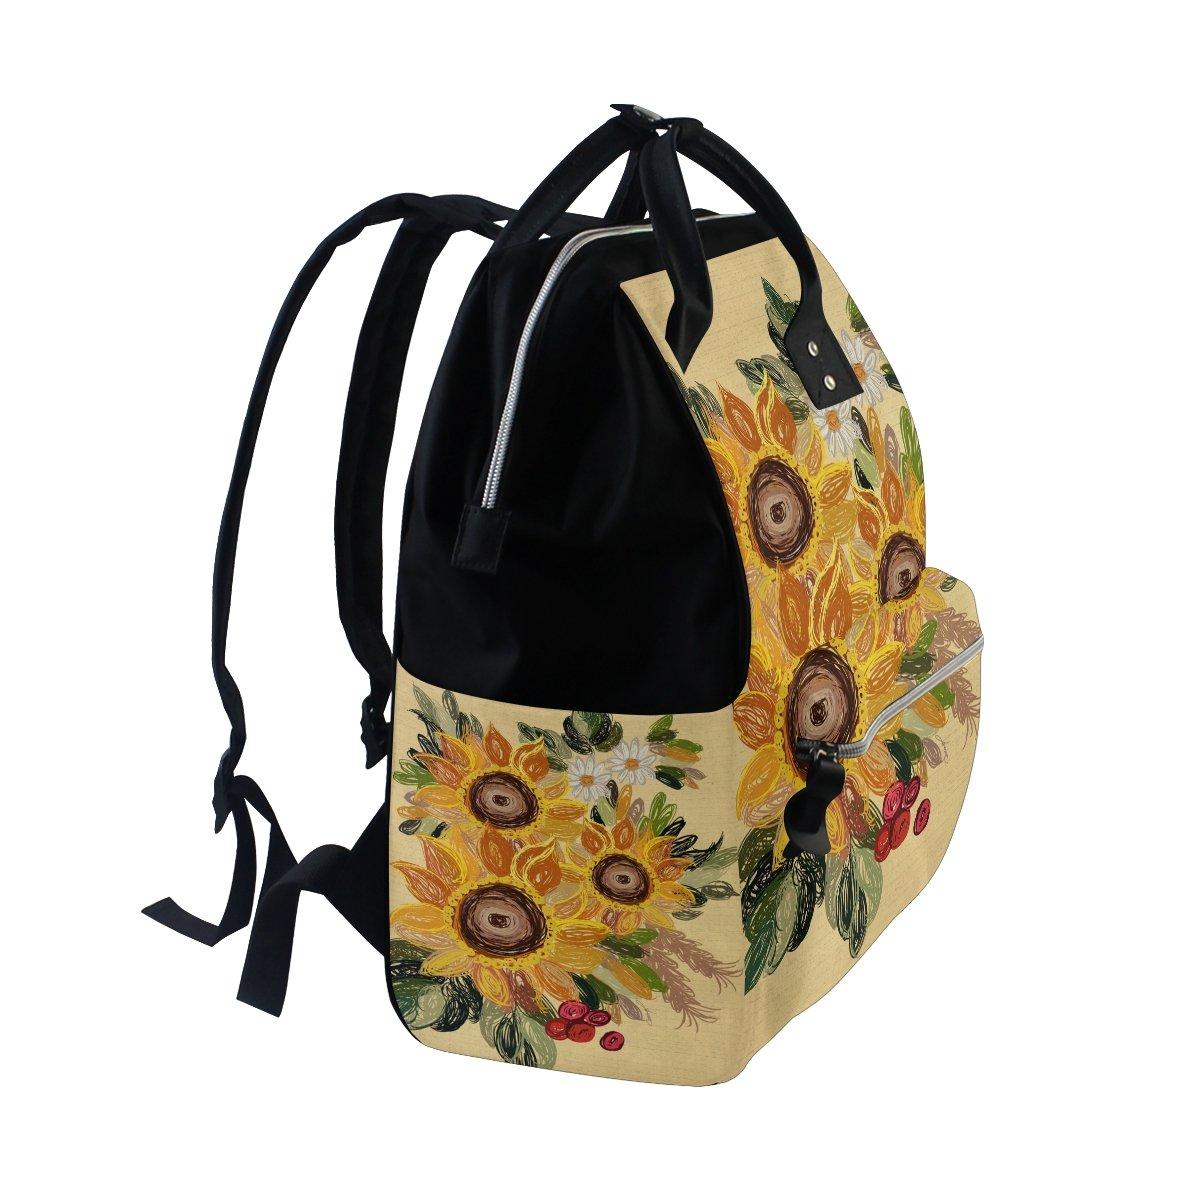 a77a083085e1 Amazon.com: ZOEO Backpack Purse Vintage Sunflower College Designer ...